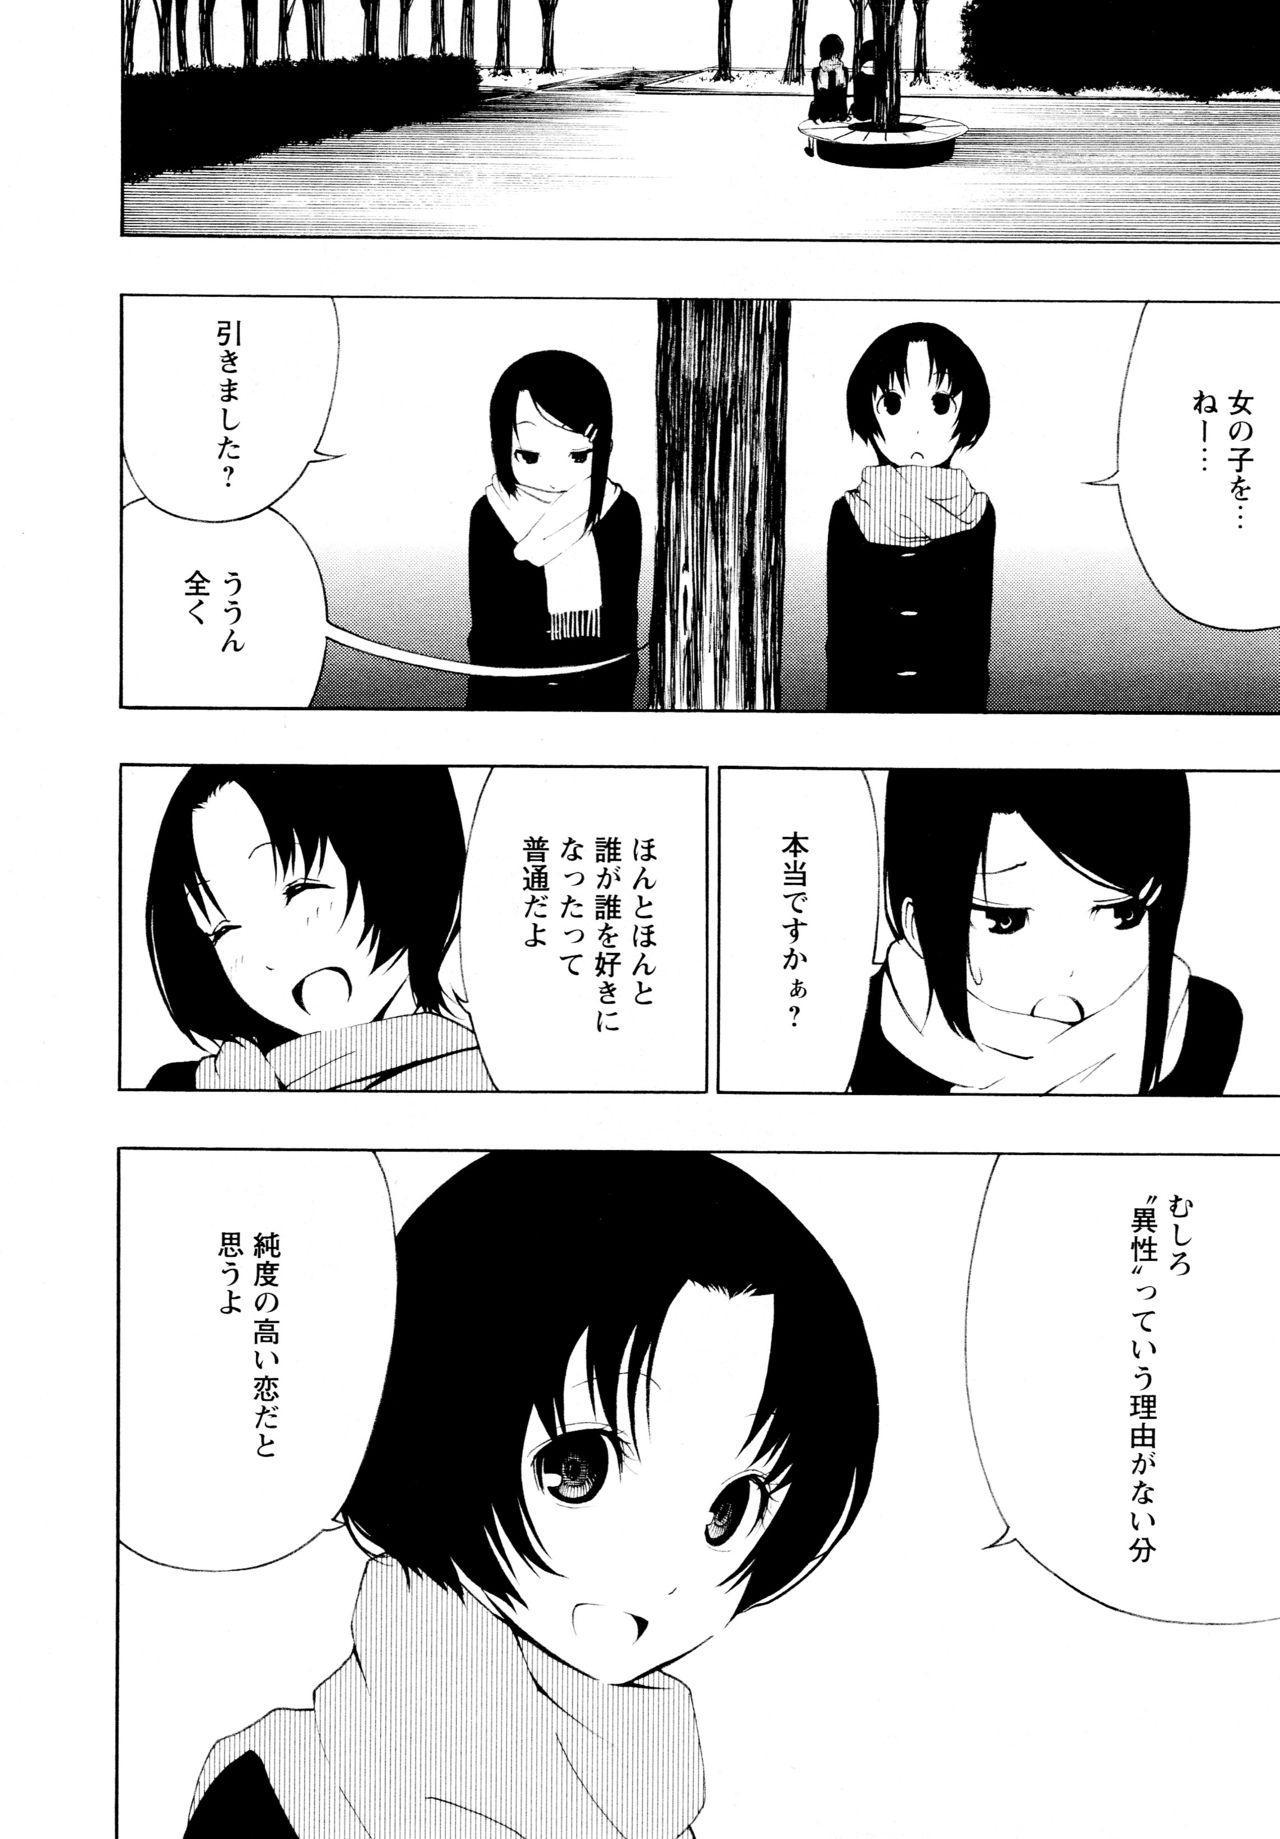 [Anthology] L Girls -Love Girls- 04 31